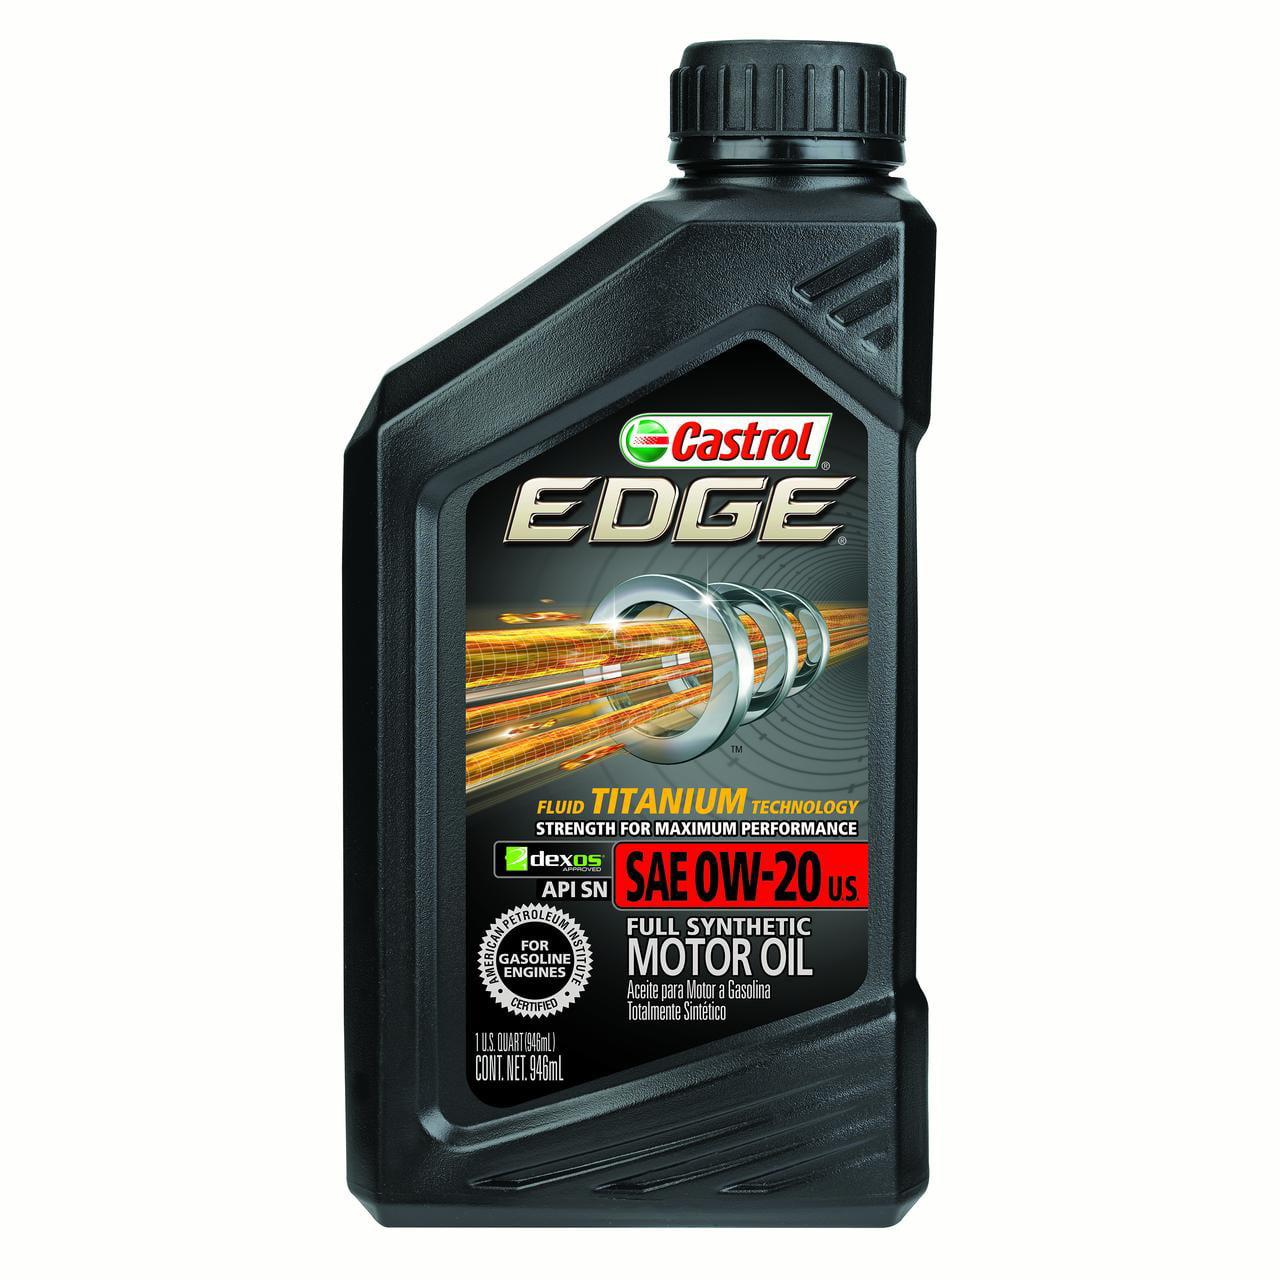 Castrol EDGE 0W-20 Full Synthetic Motor Oil, 1 QT by Castrol